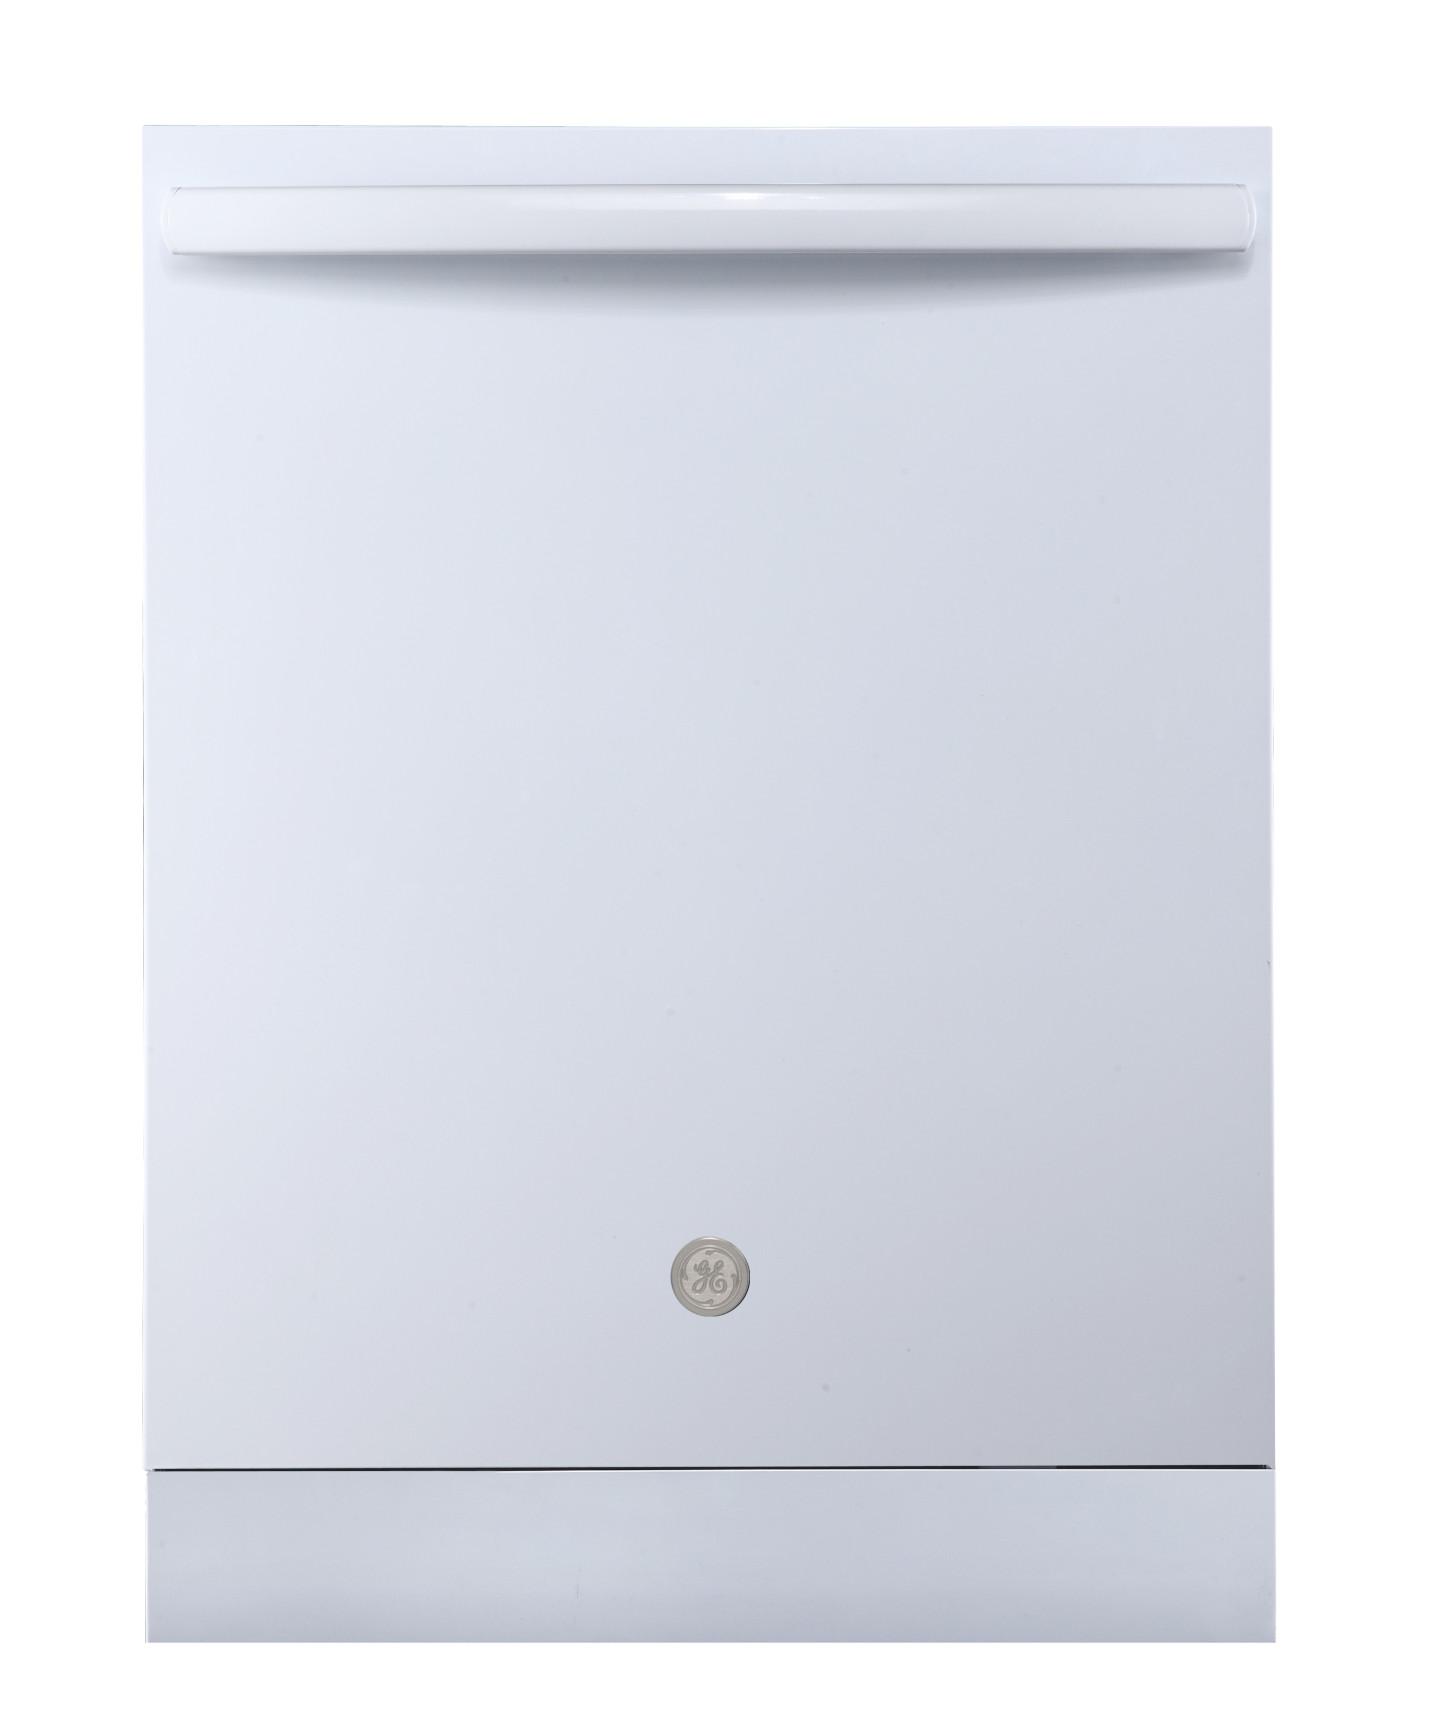 22627 – Dishwasher – GBT632SGMWW – Front